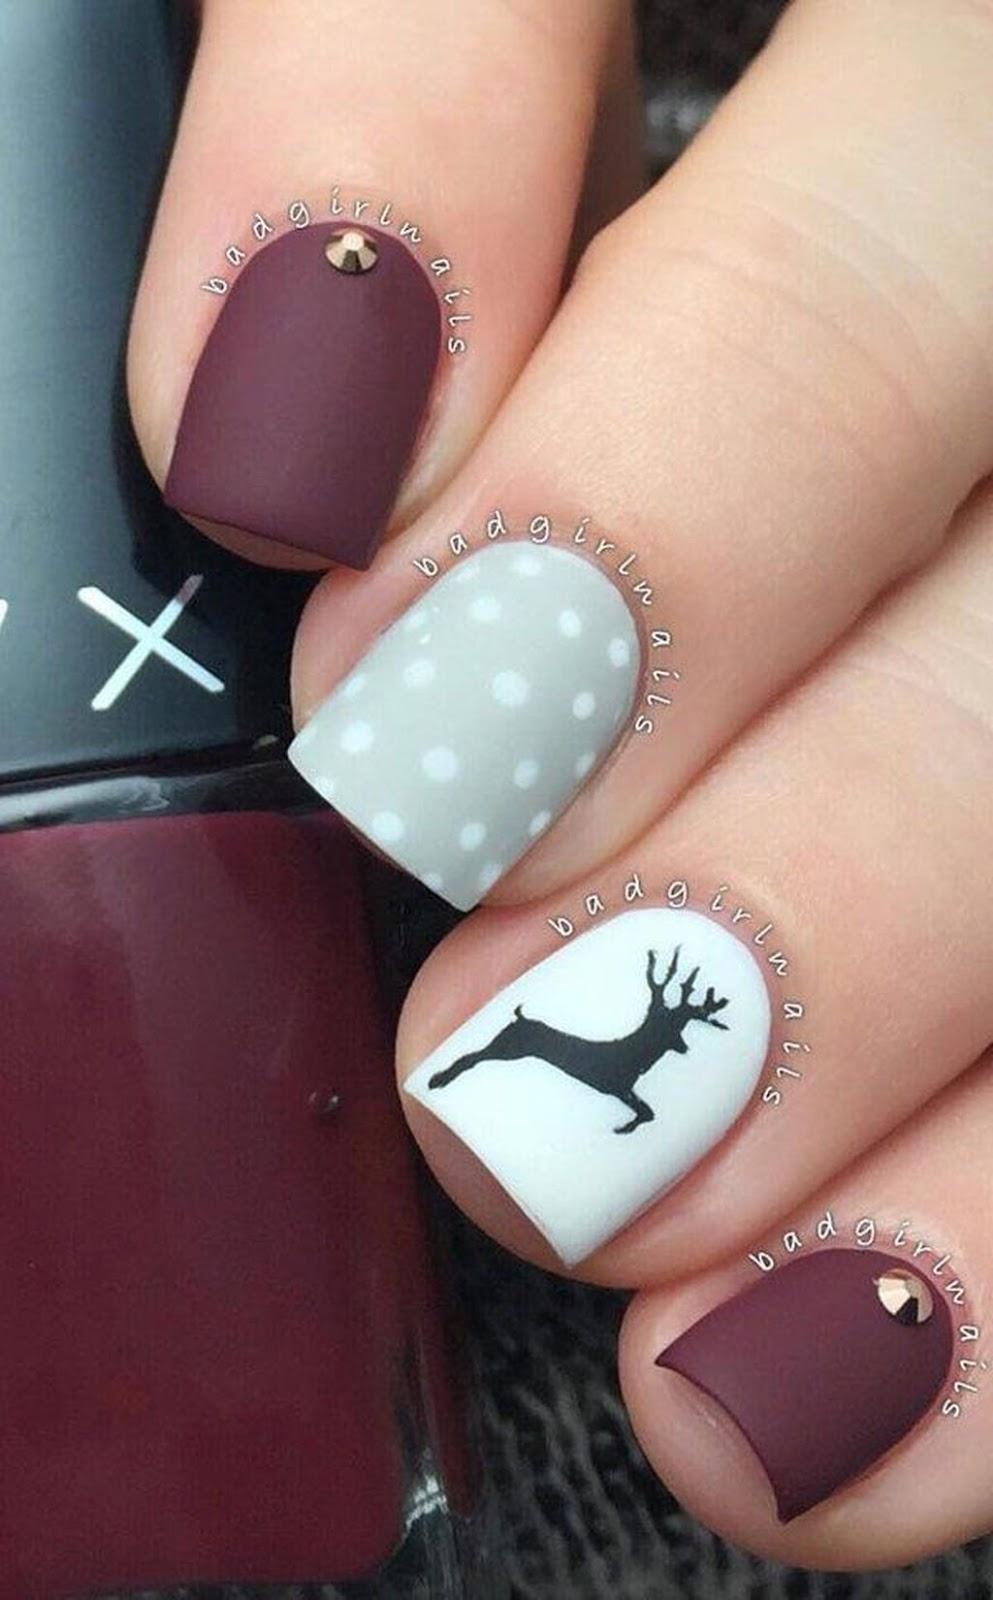 incredible nail art idea